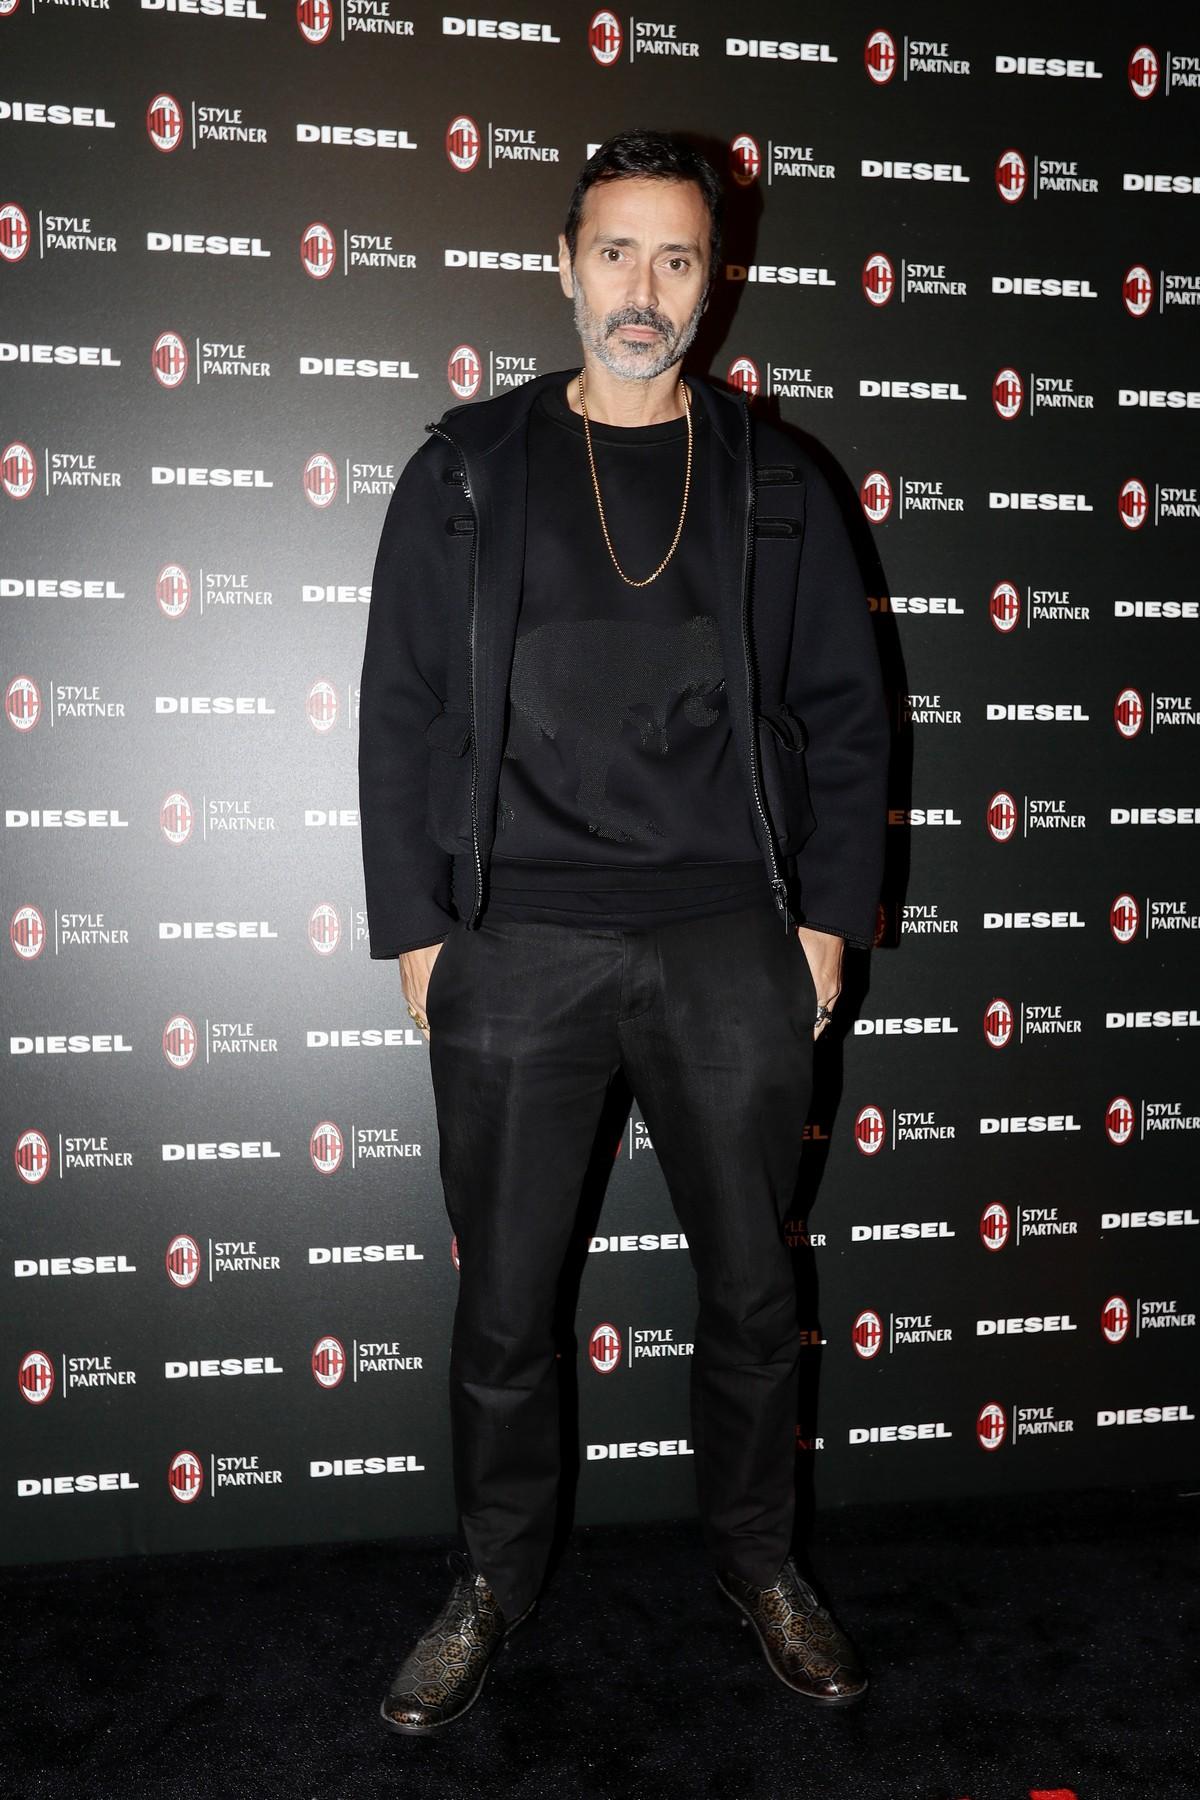 Diesel AC Milan collezione 2018 party